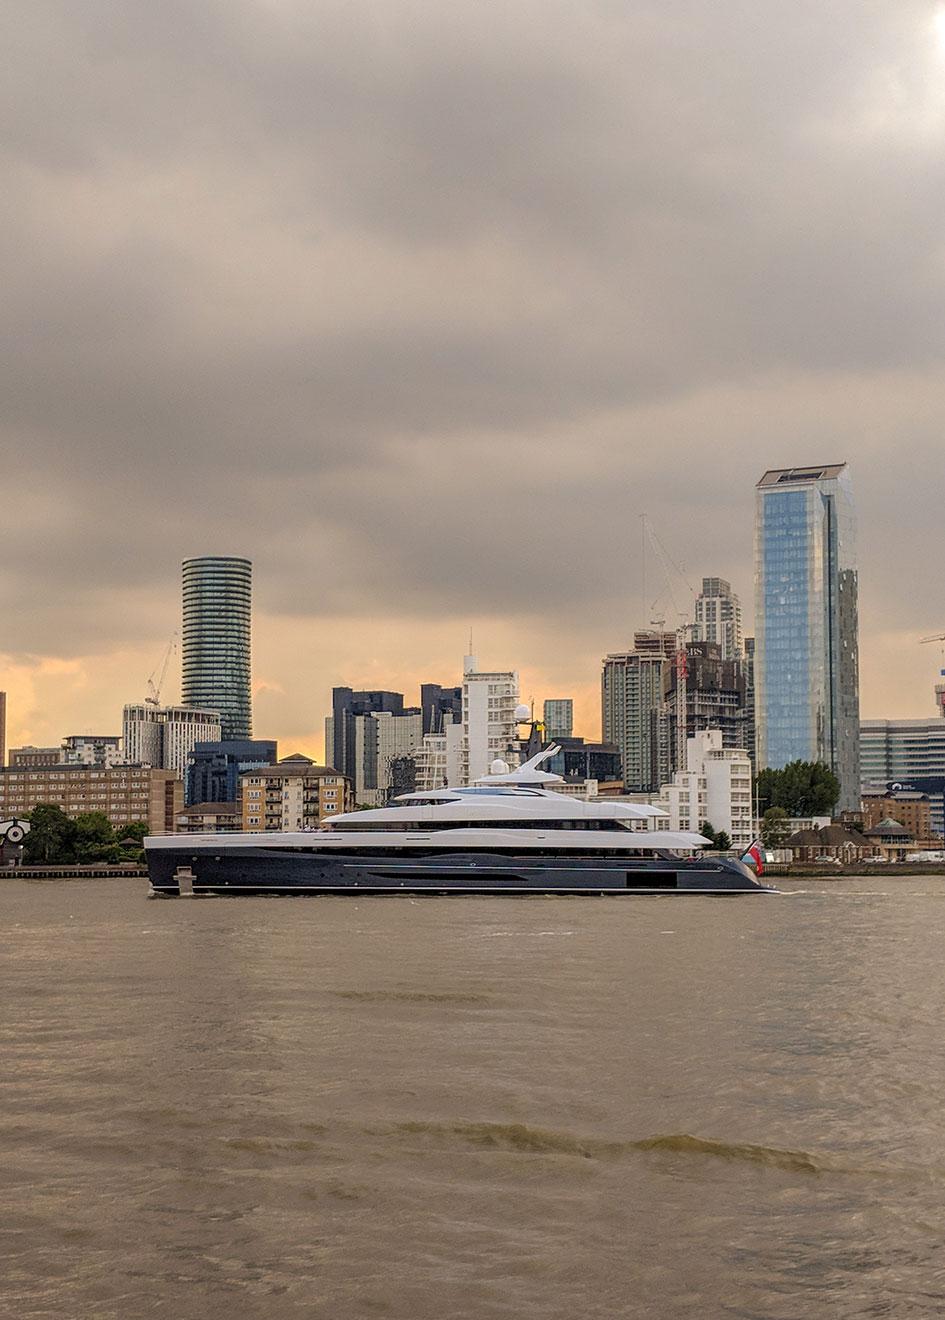 Abeking-Rasmussen-Yacht-Elandess--Vertical